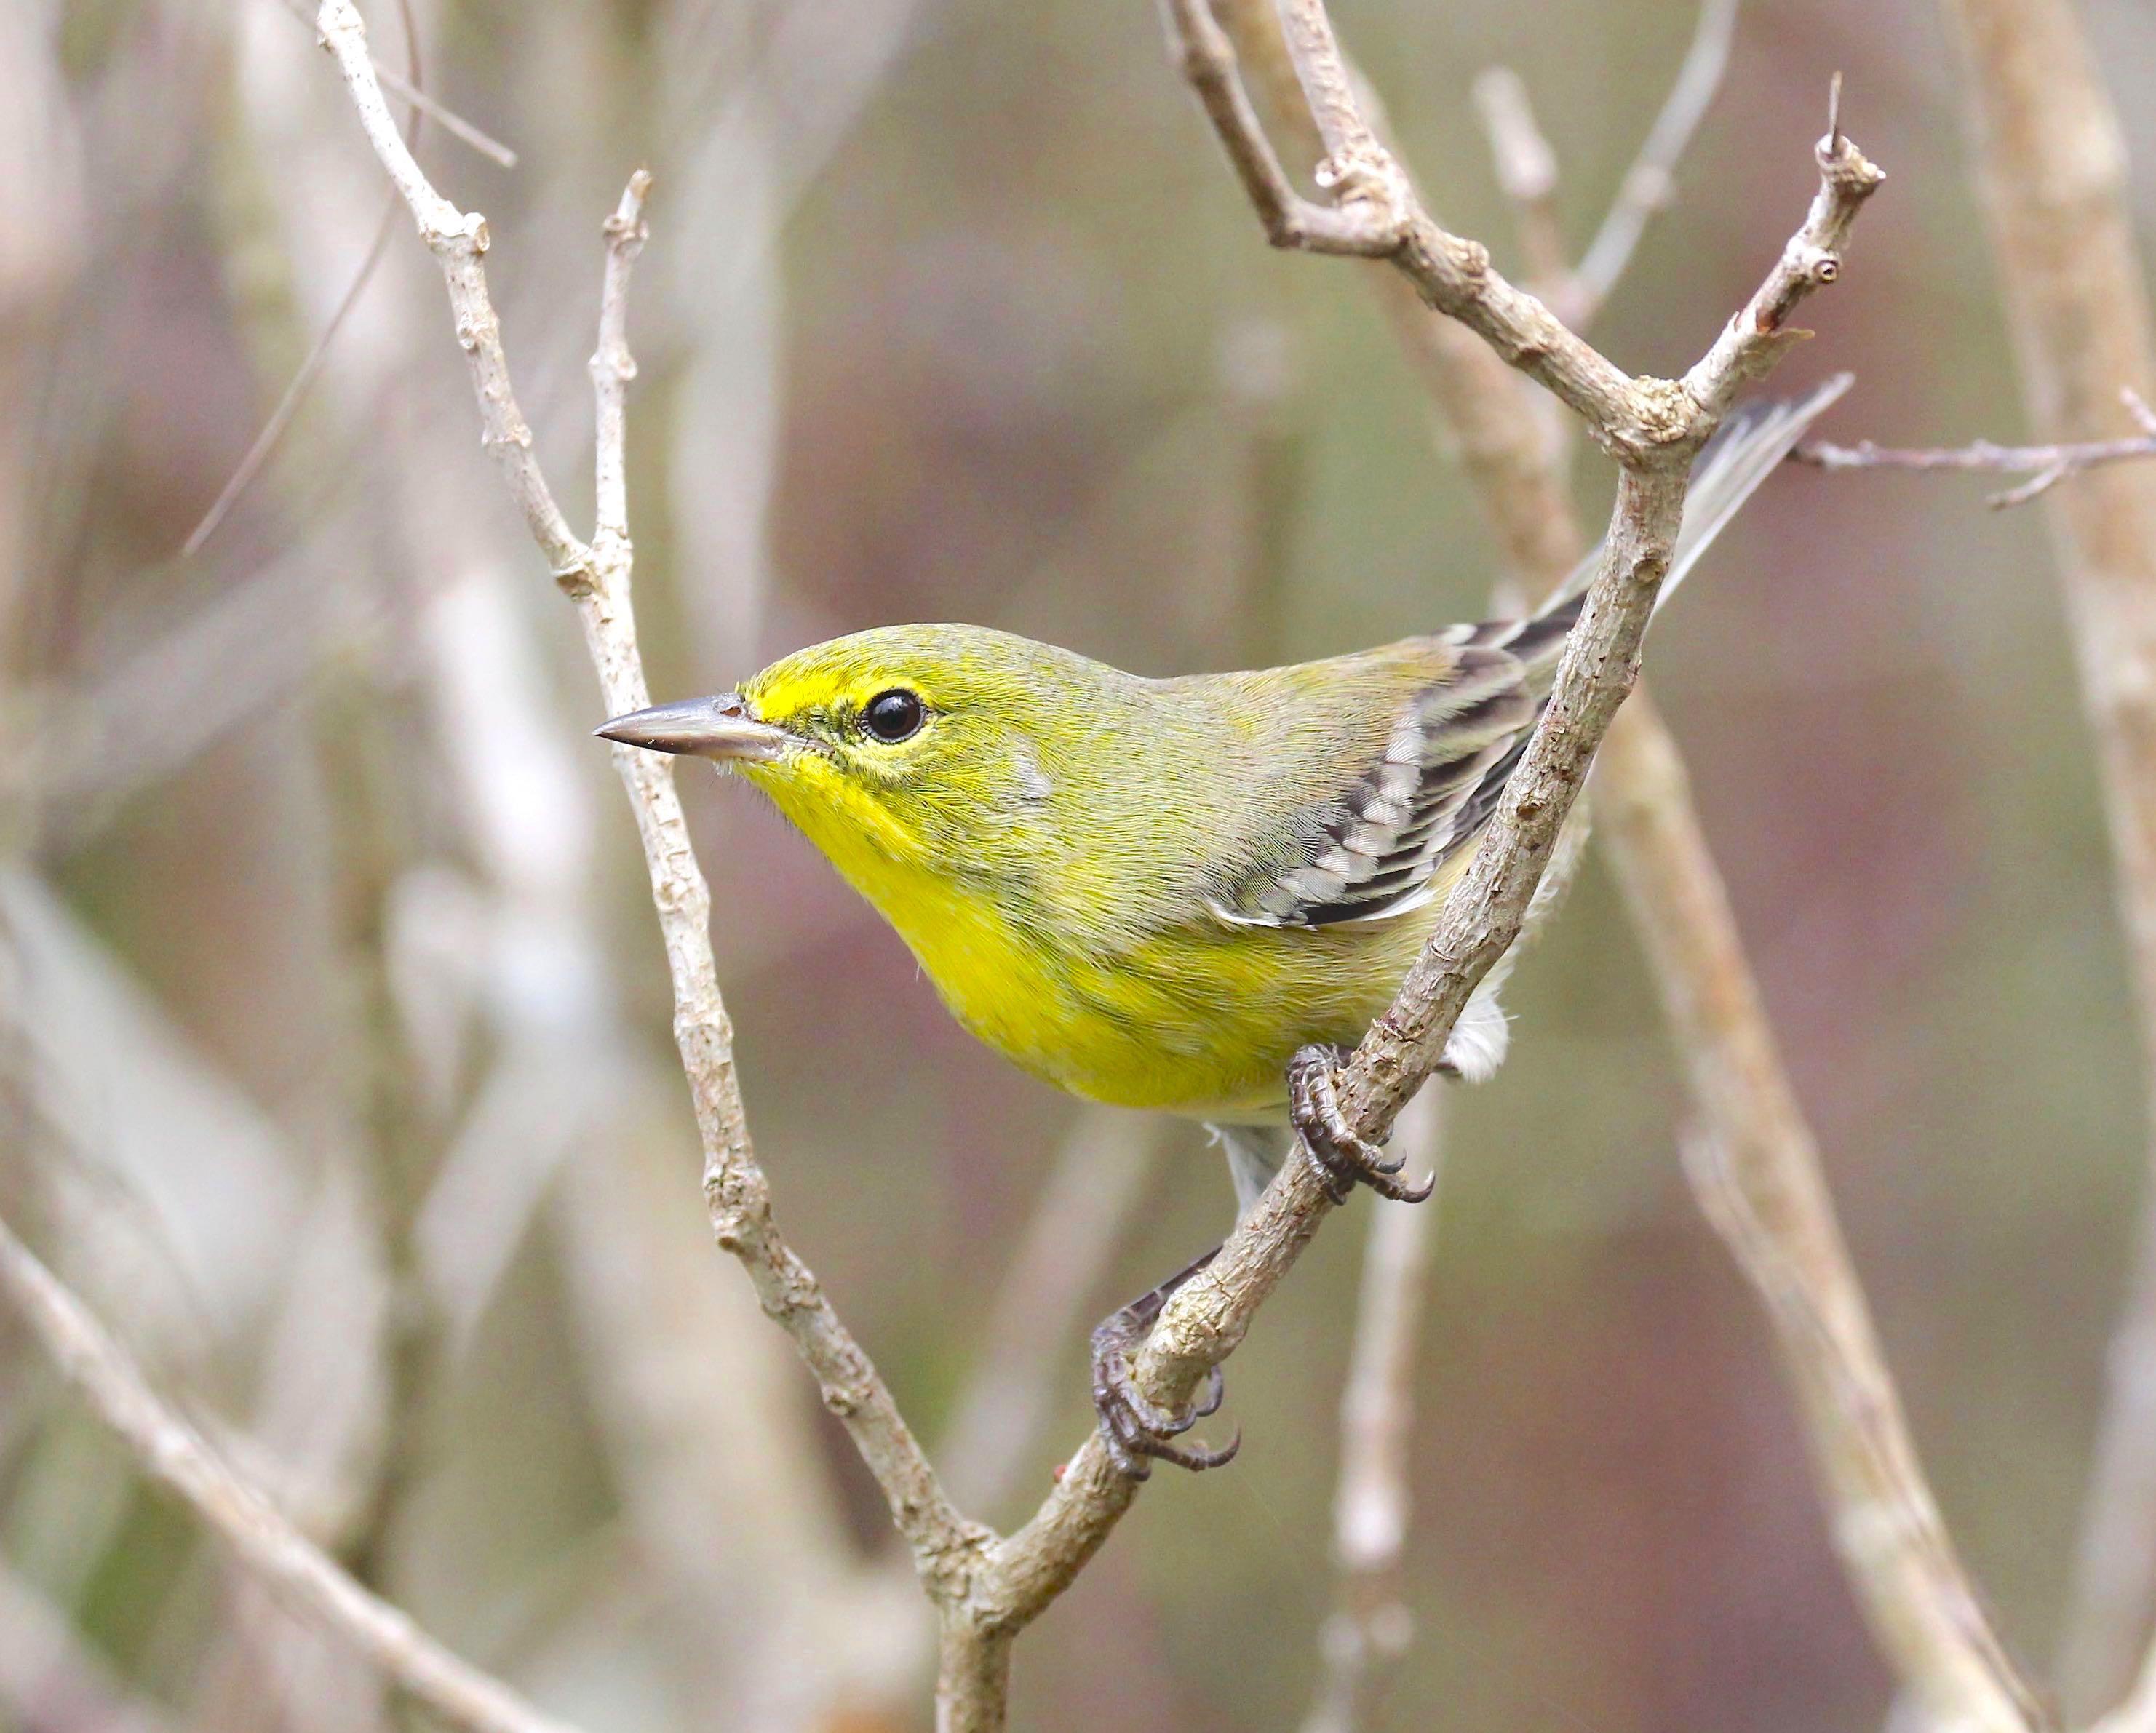 Pine Warbler, Abaco Bahamas (Bruce Hallett)